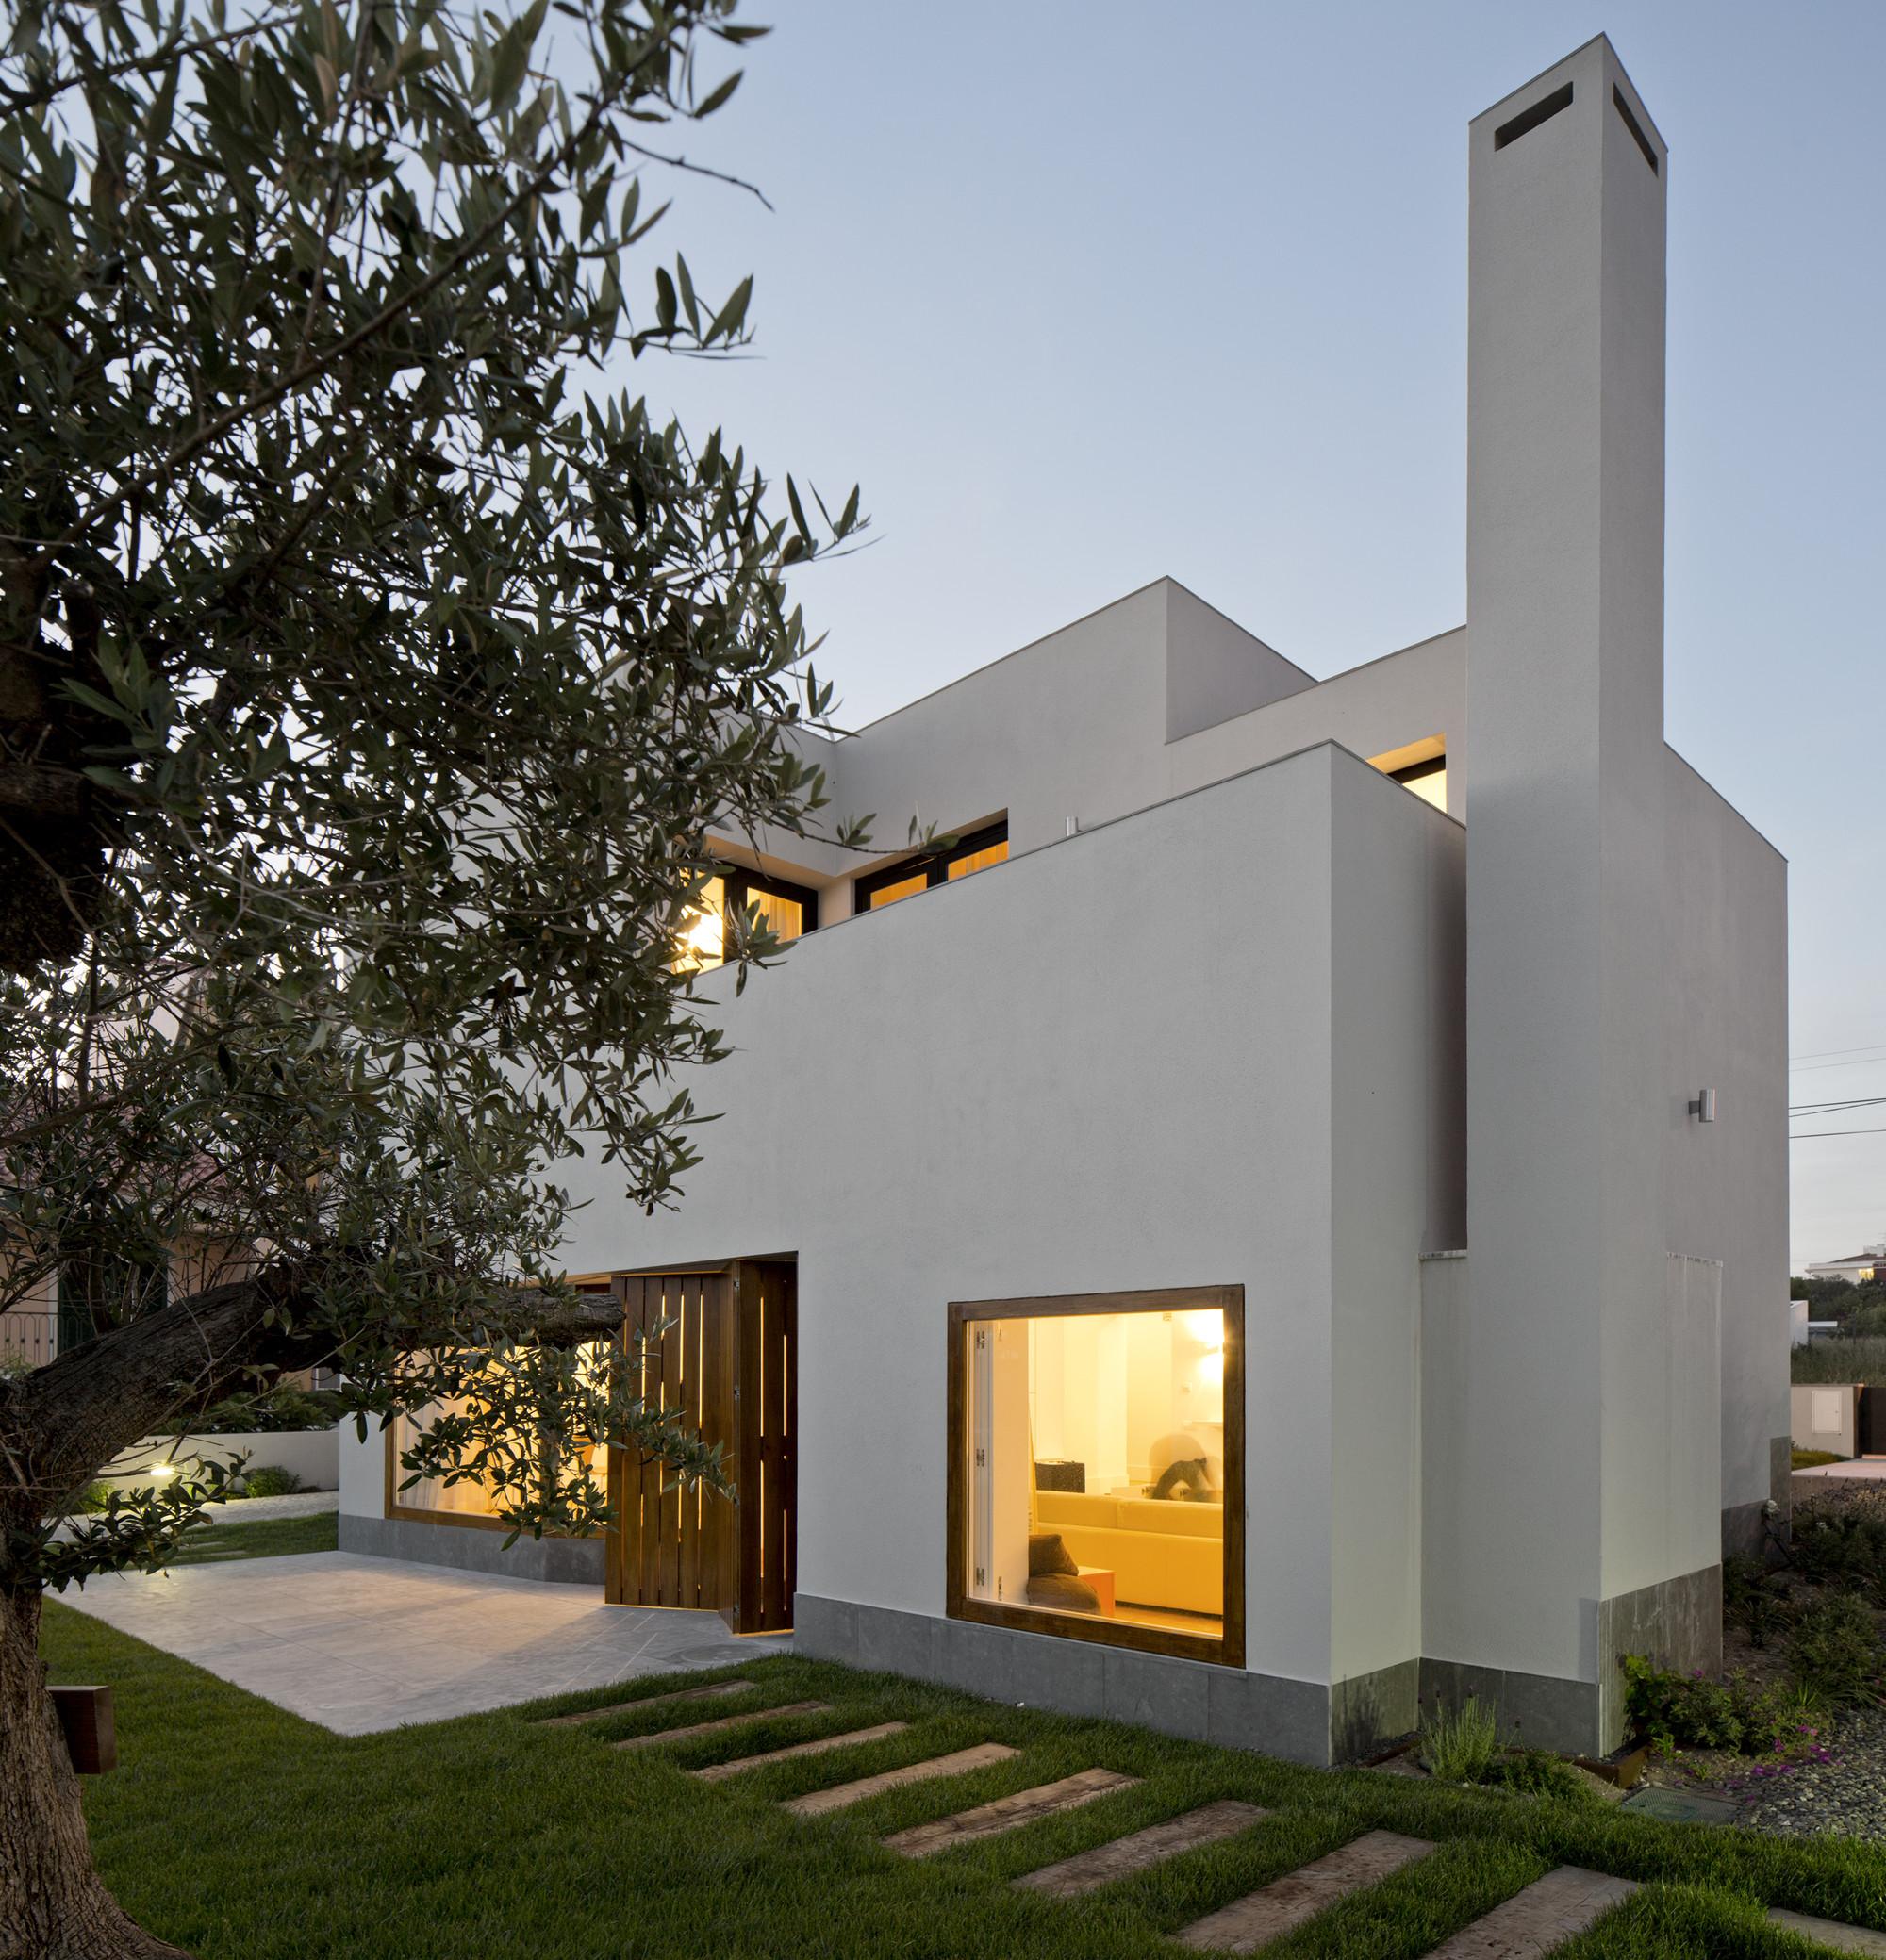 House in Pêro Pinheiro / brunosilvestreARCHITECTURE